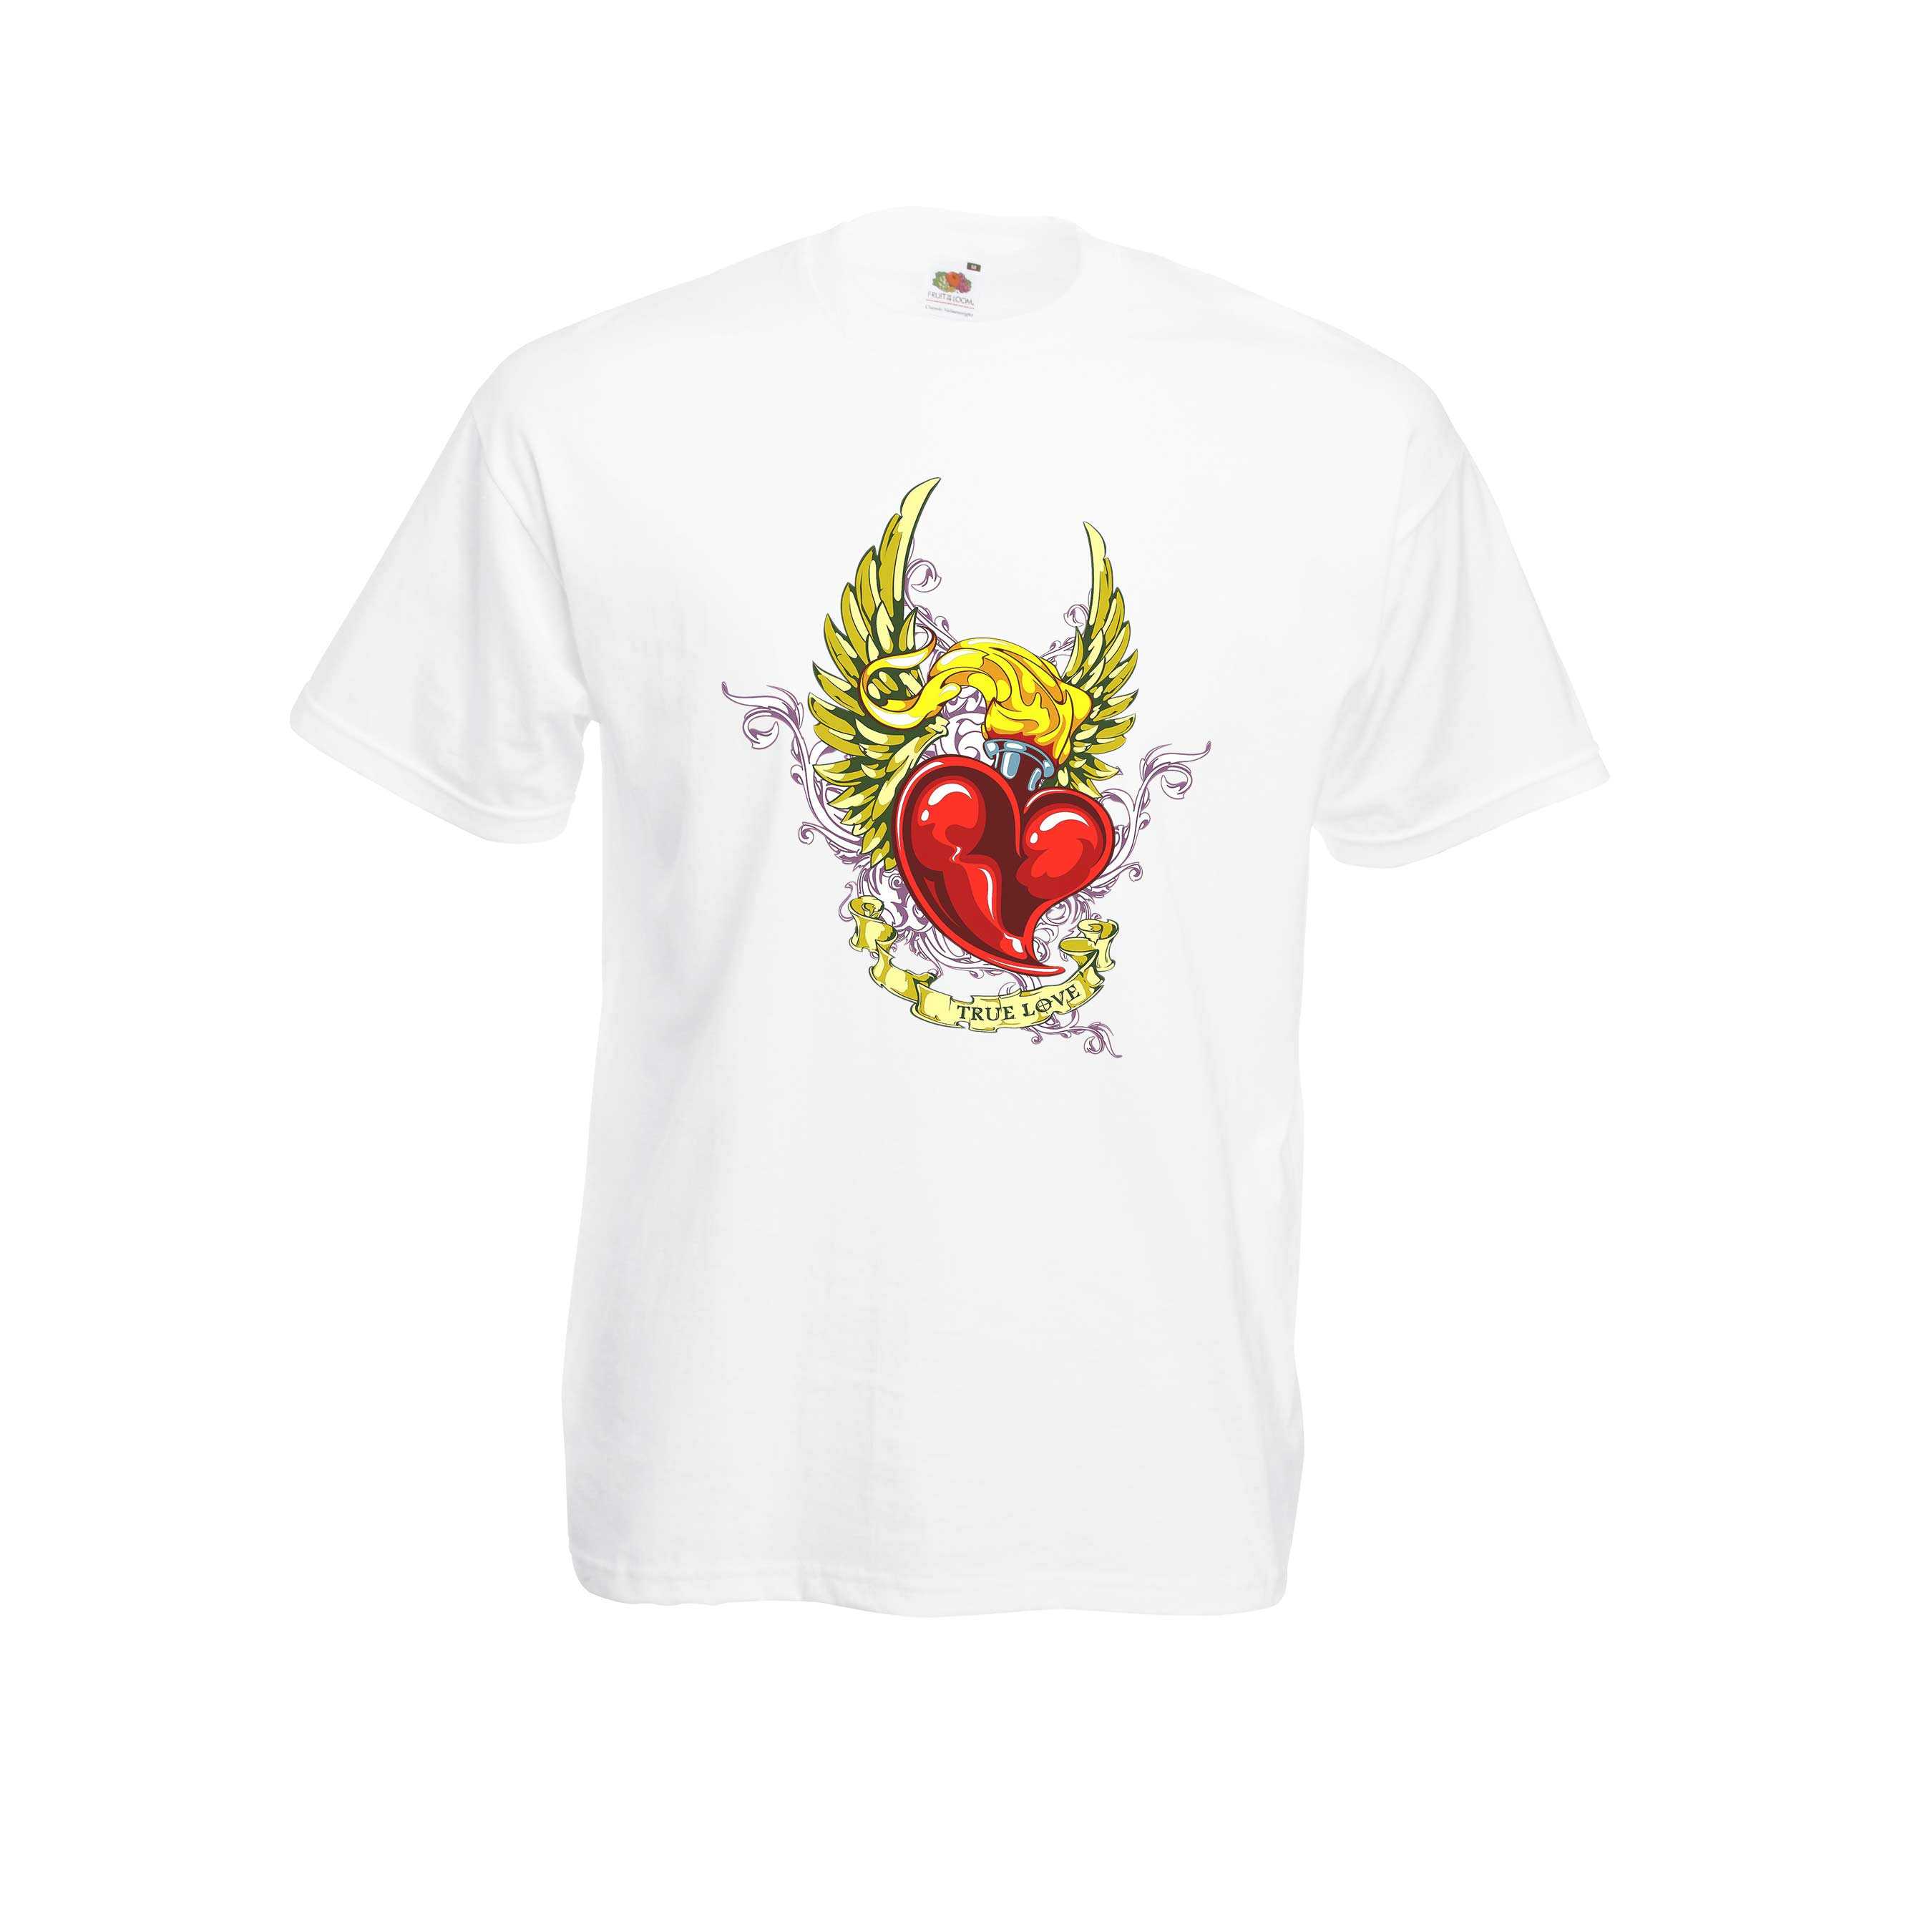 Love Tattoo design for t-shirt, hoodie & sweatshirt